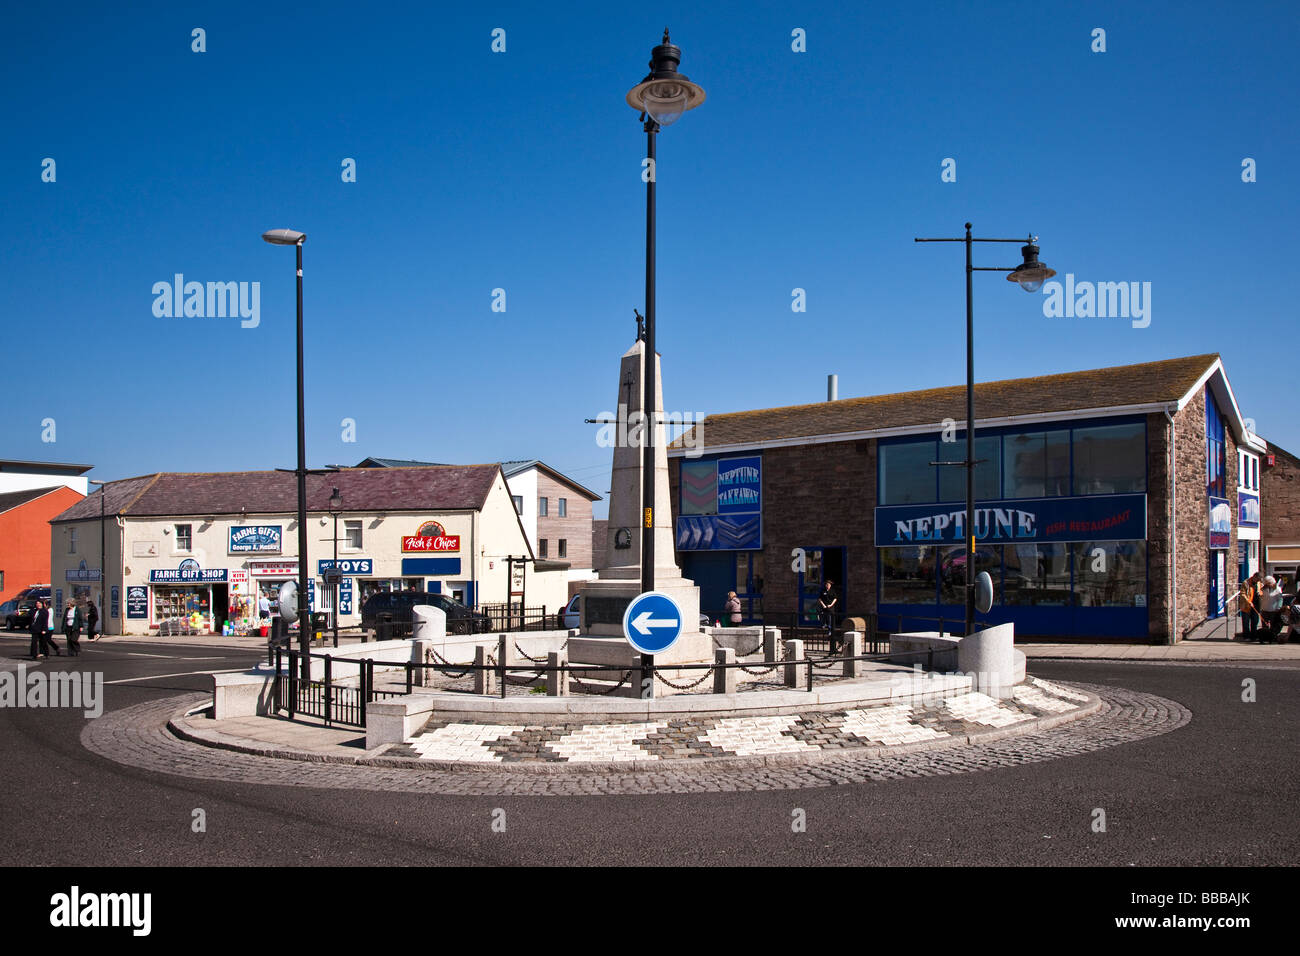 Seahouses traditional fishing village on the Northumberland Coast - Stock Image